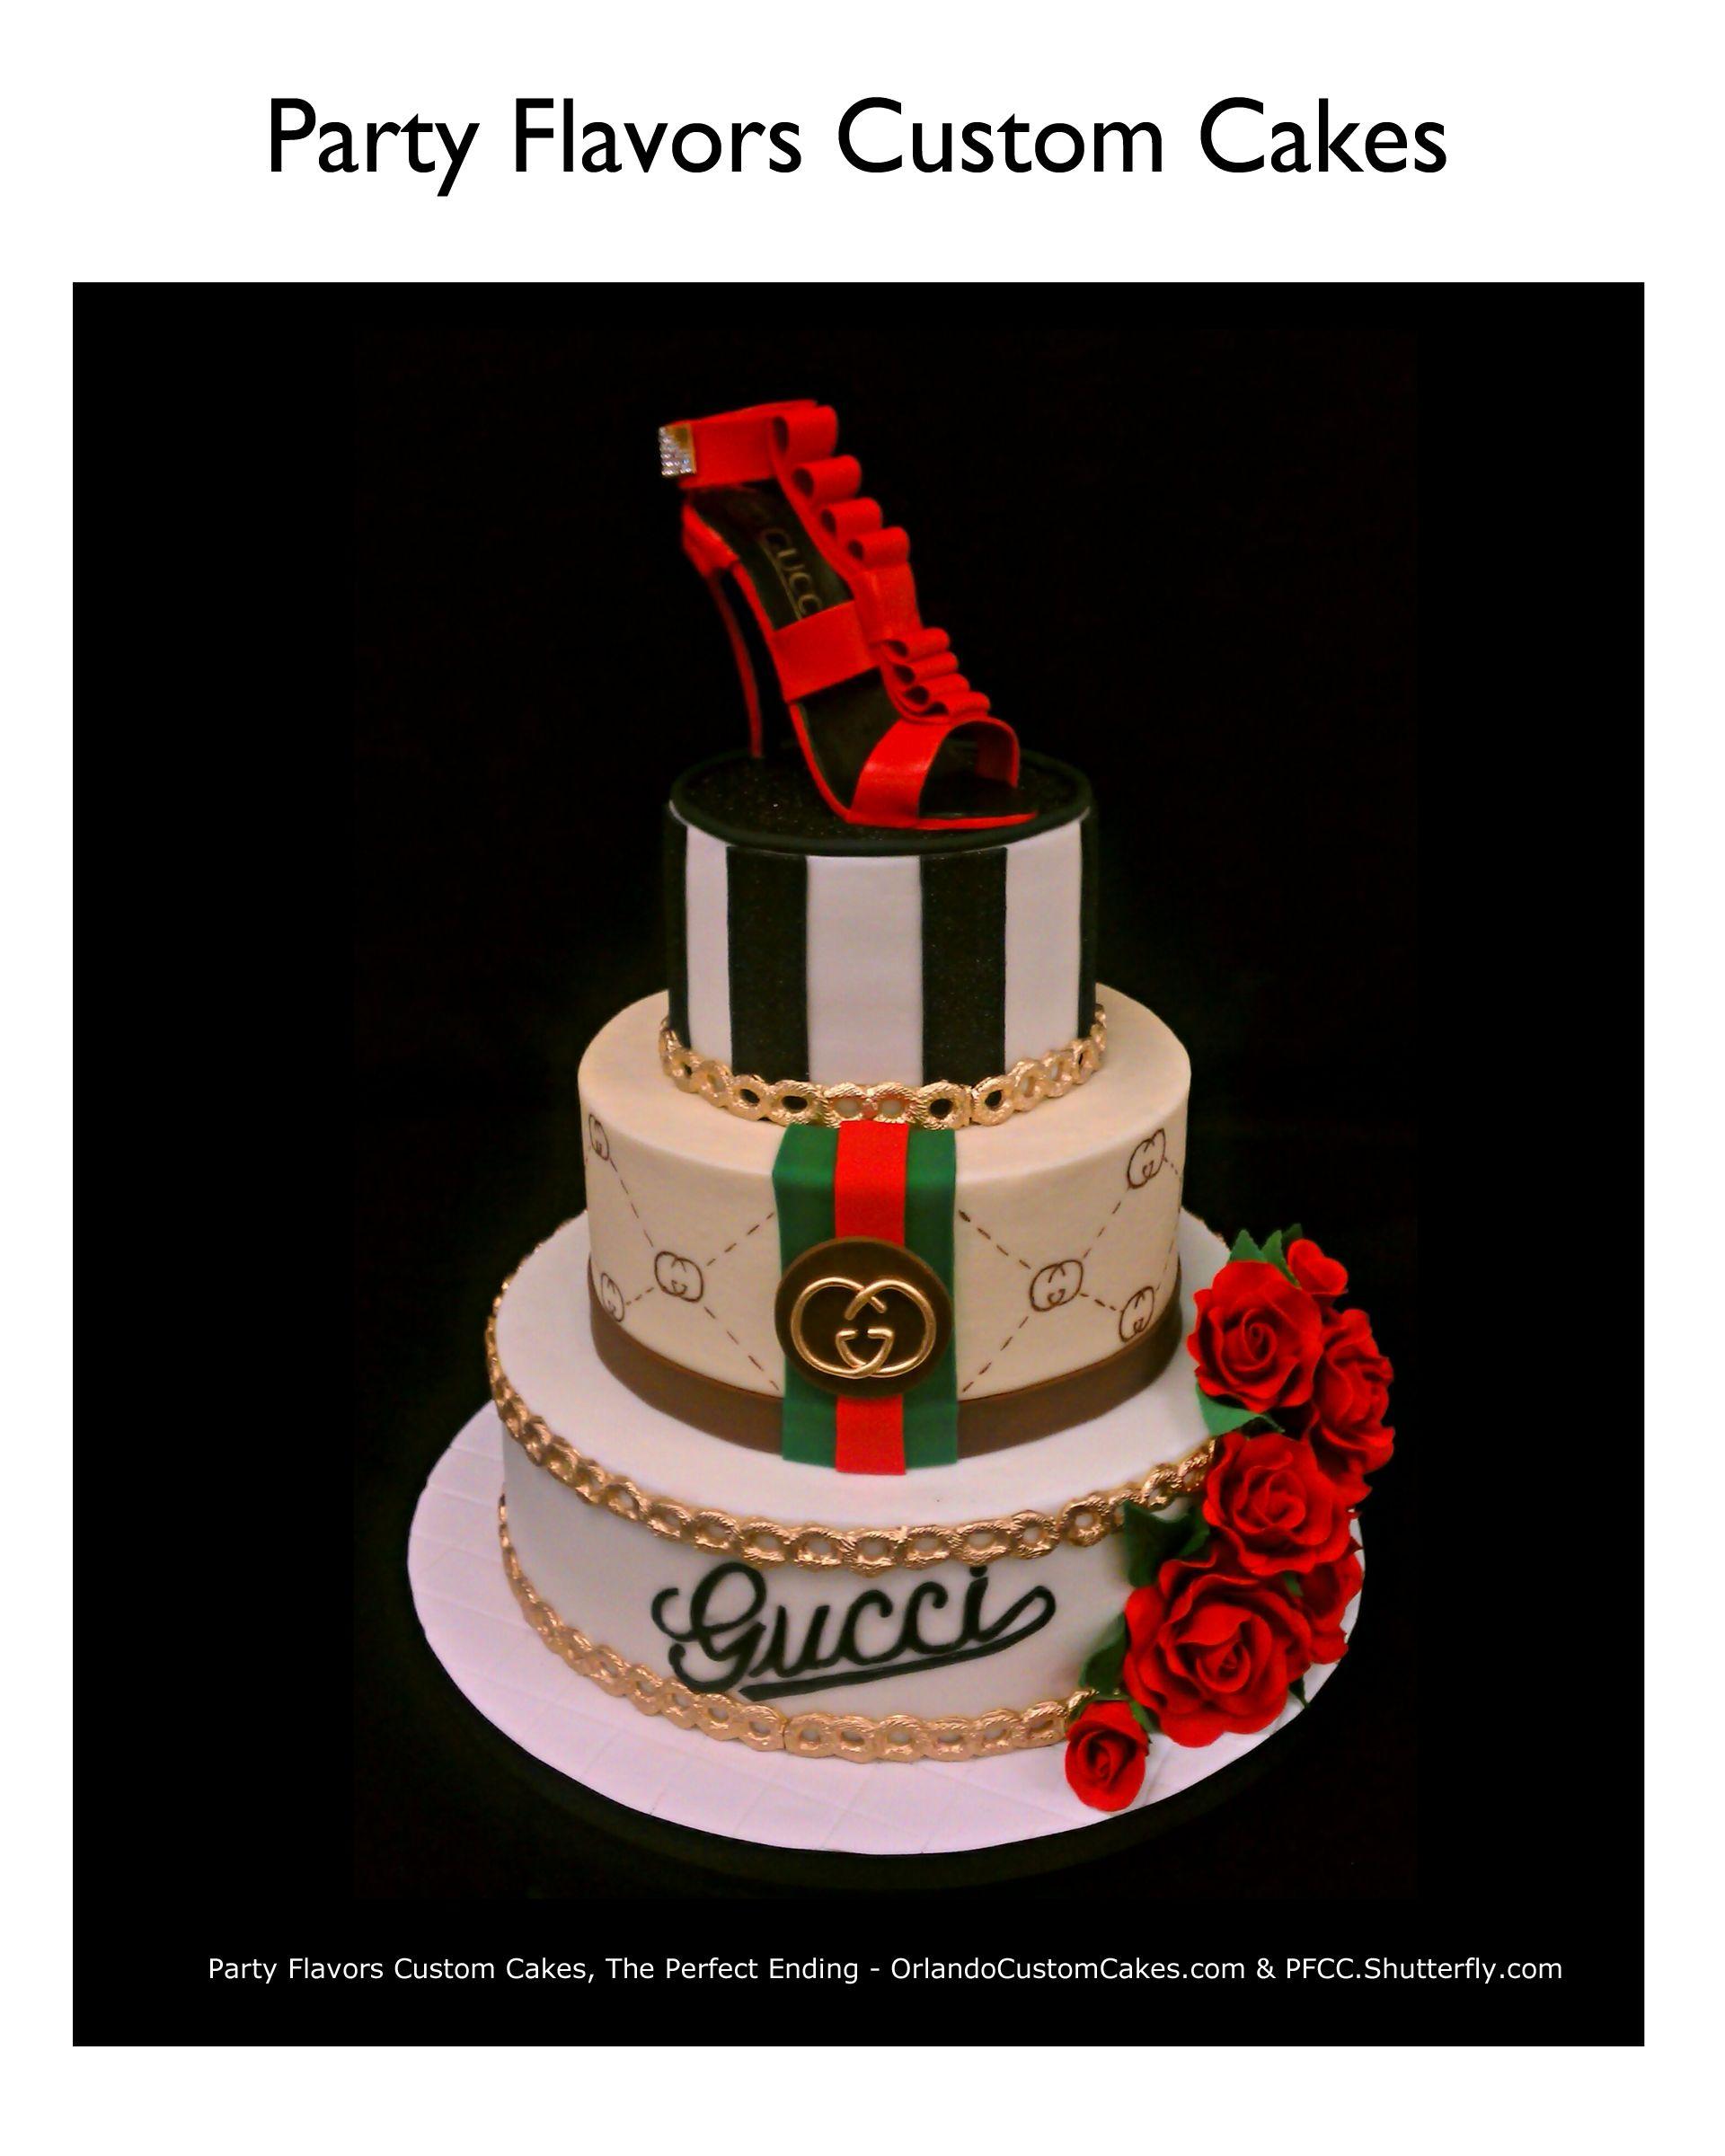 c80b762e5b22c6 Gucci Buttercream Cake   Designers Birthday Cake in 2019   Cake ...